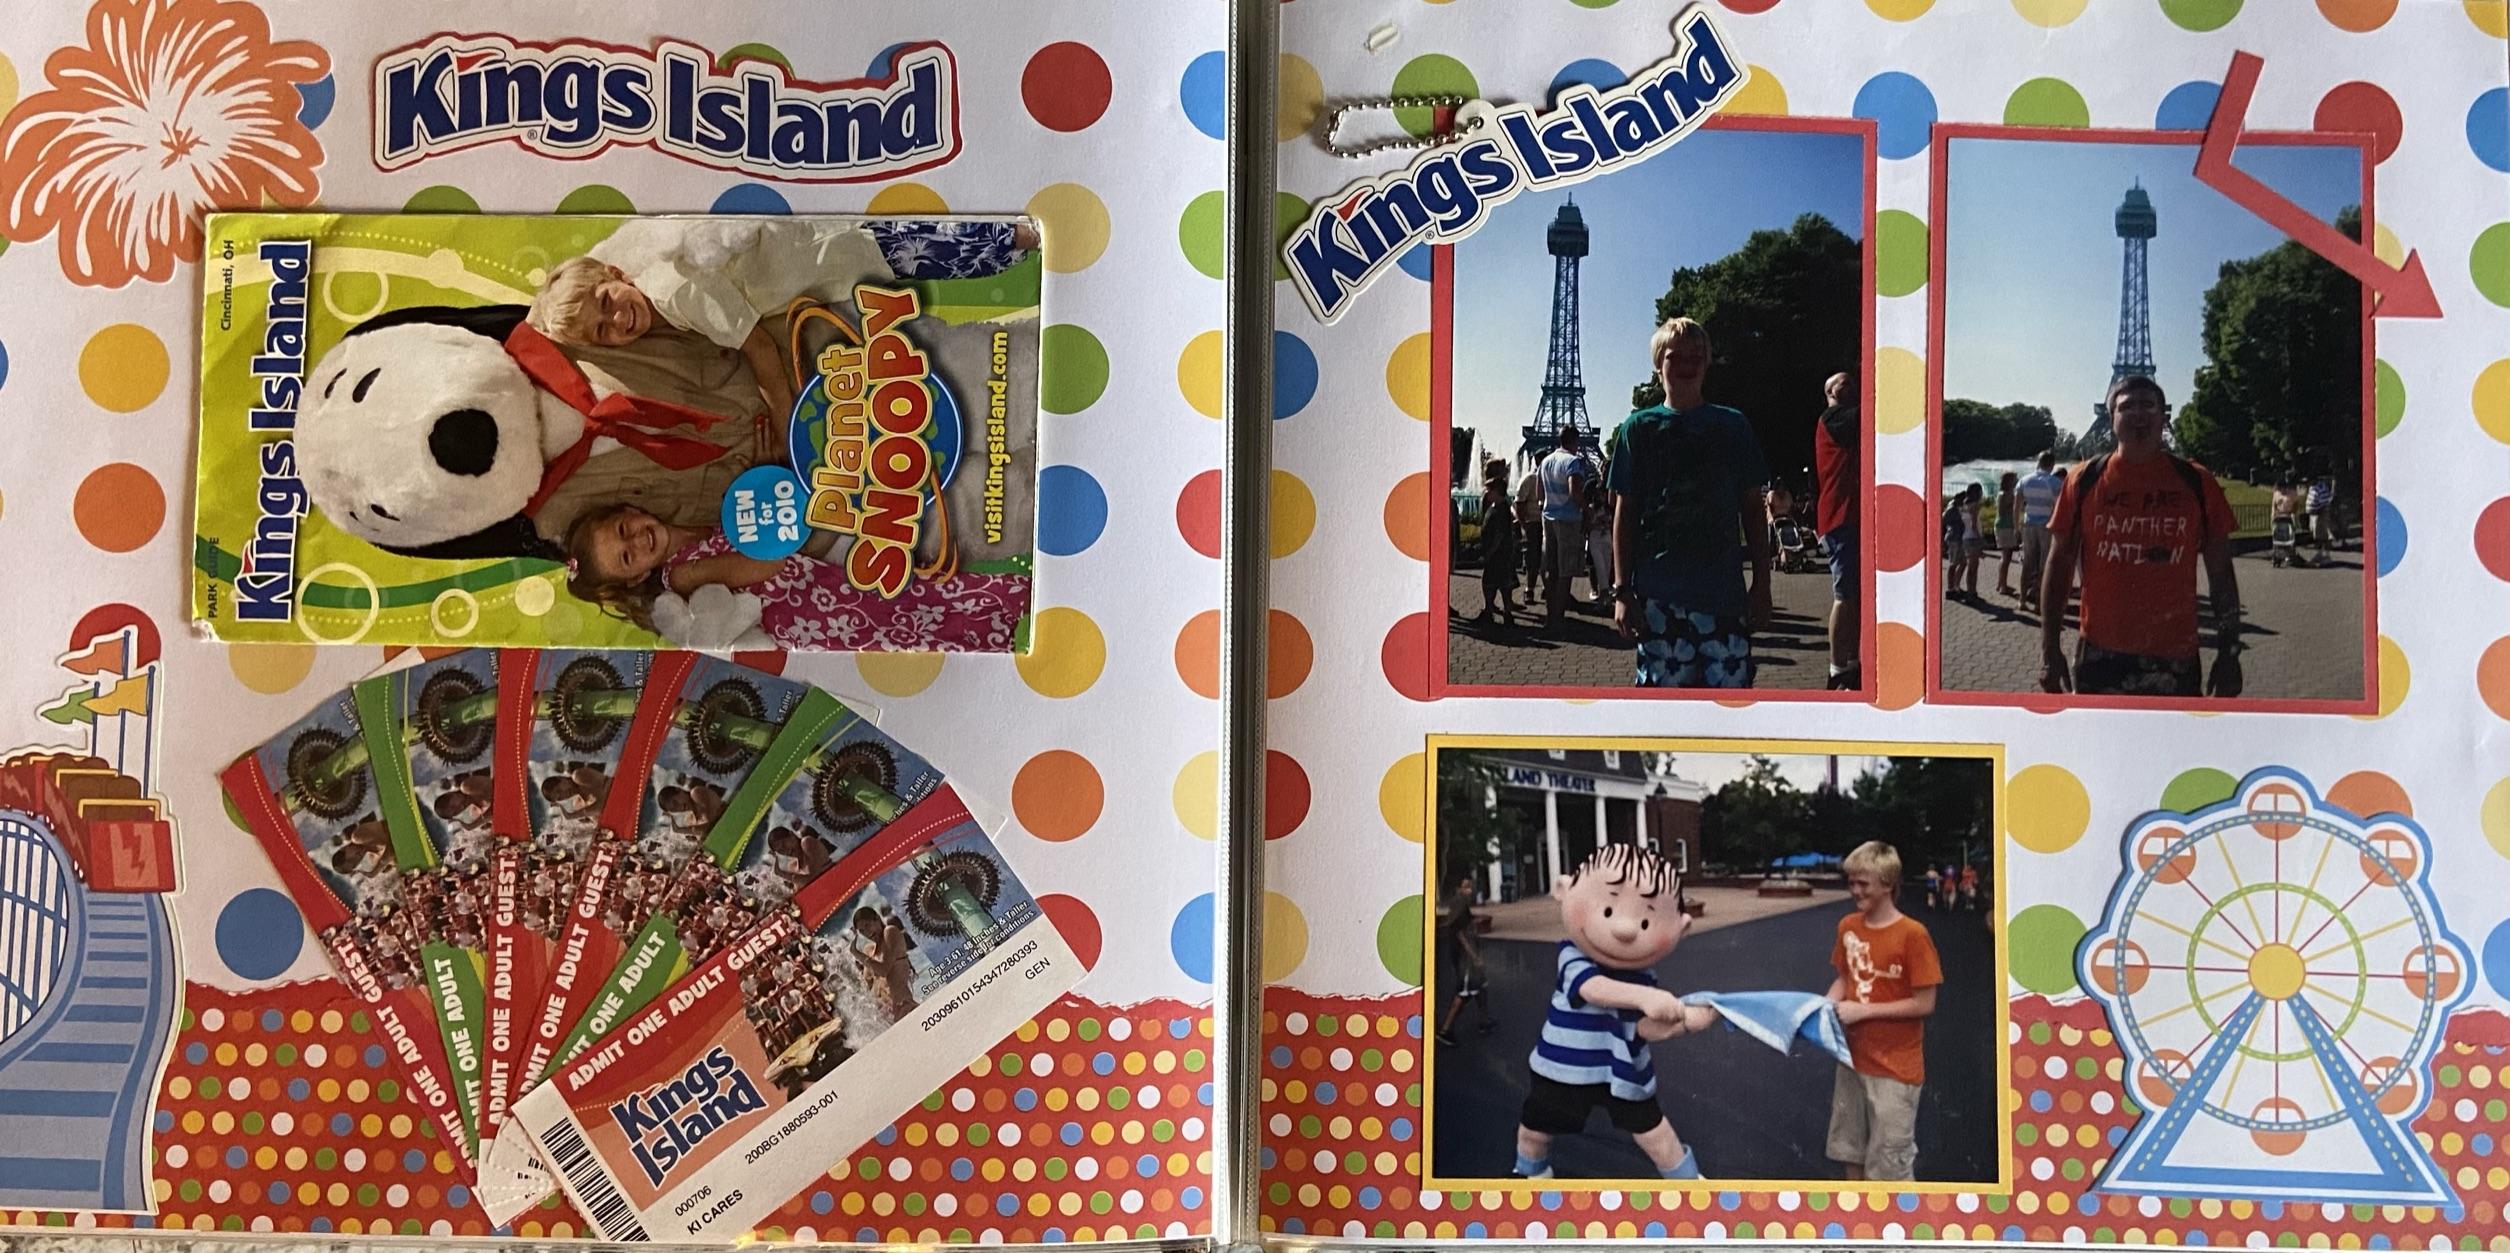 2010: Kings Island